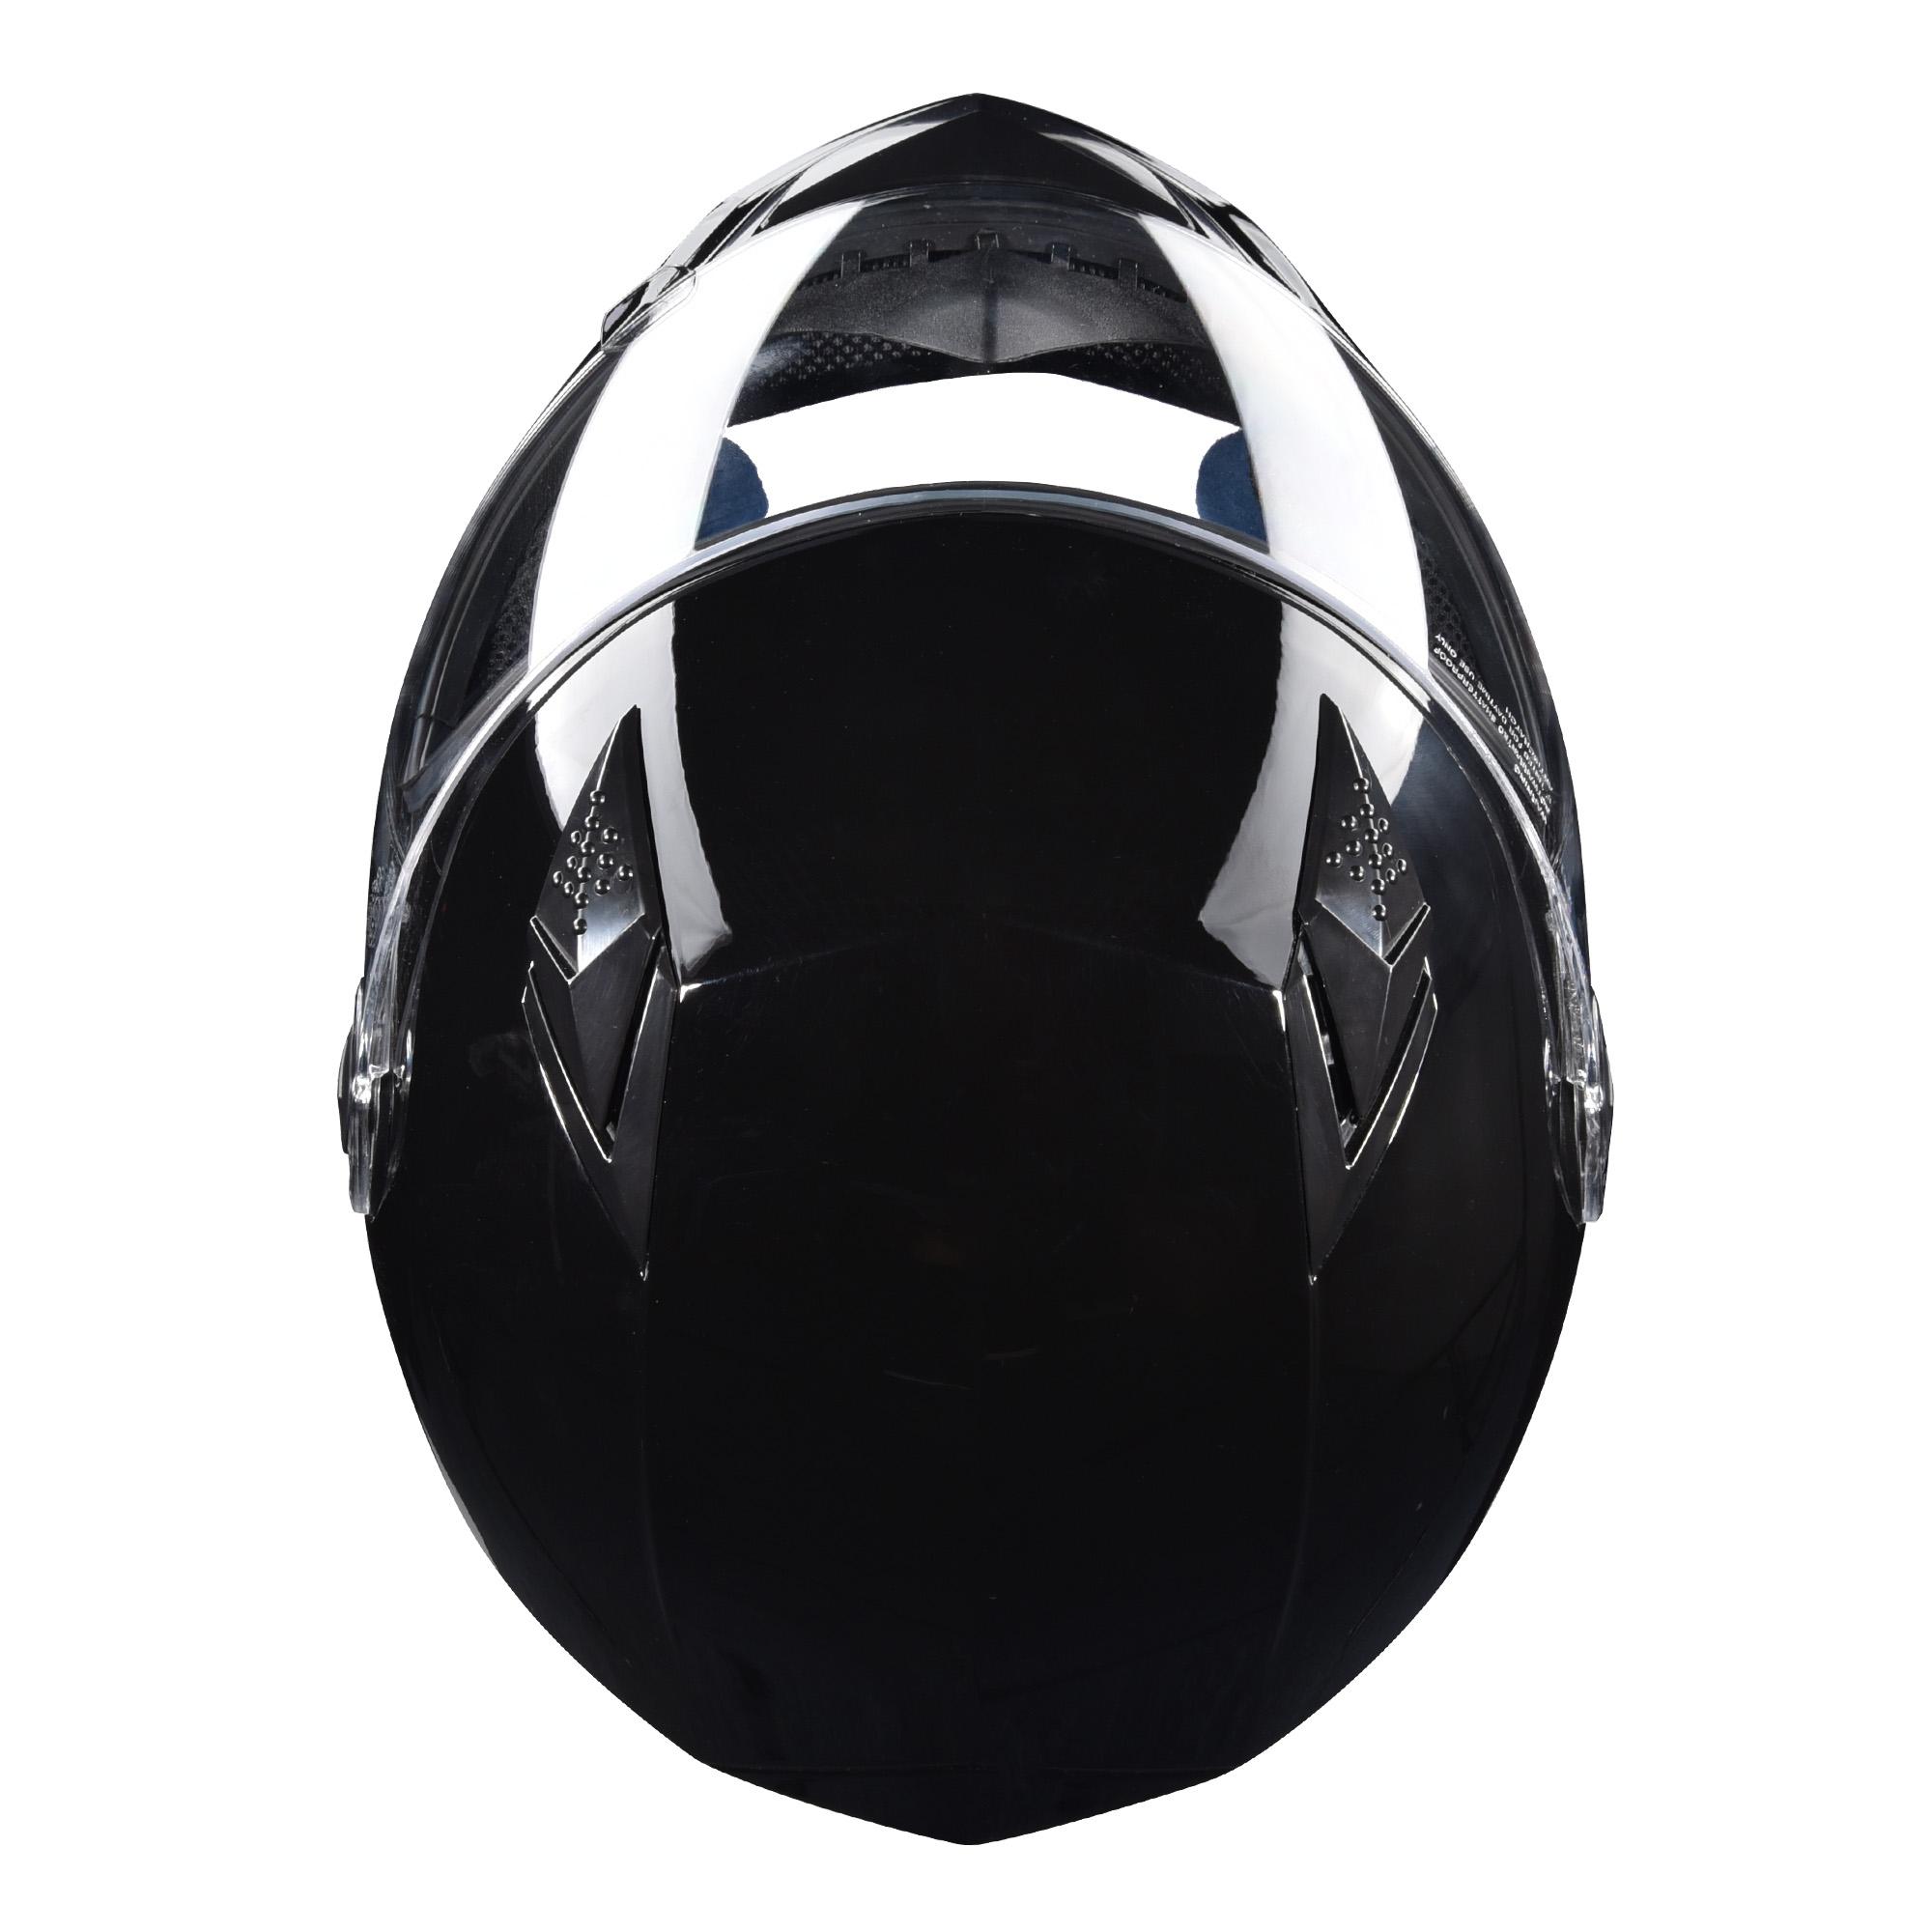 miniature 126 - AHR K12 Full Face Motorcycle Helmet DOT Air Vents Clear Visor Racing S M L XL